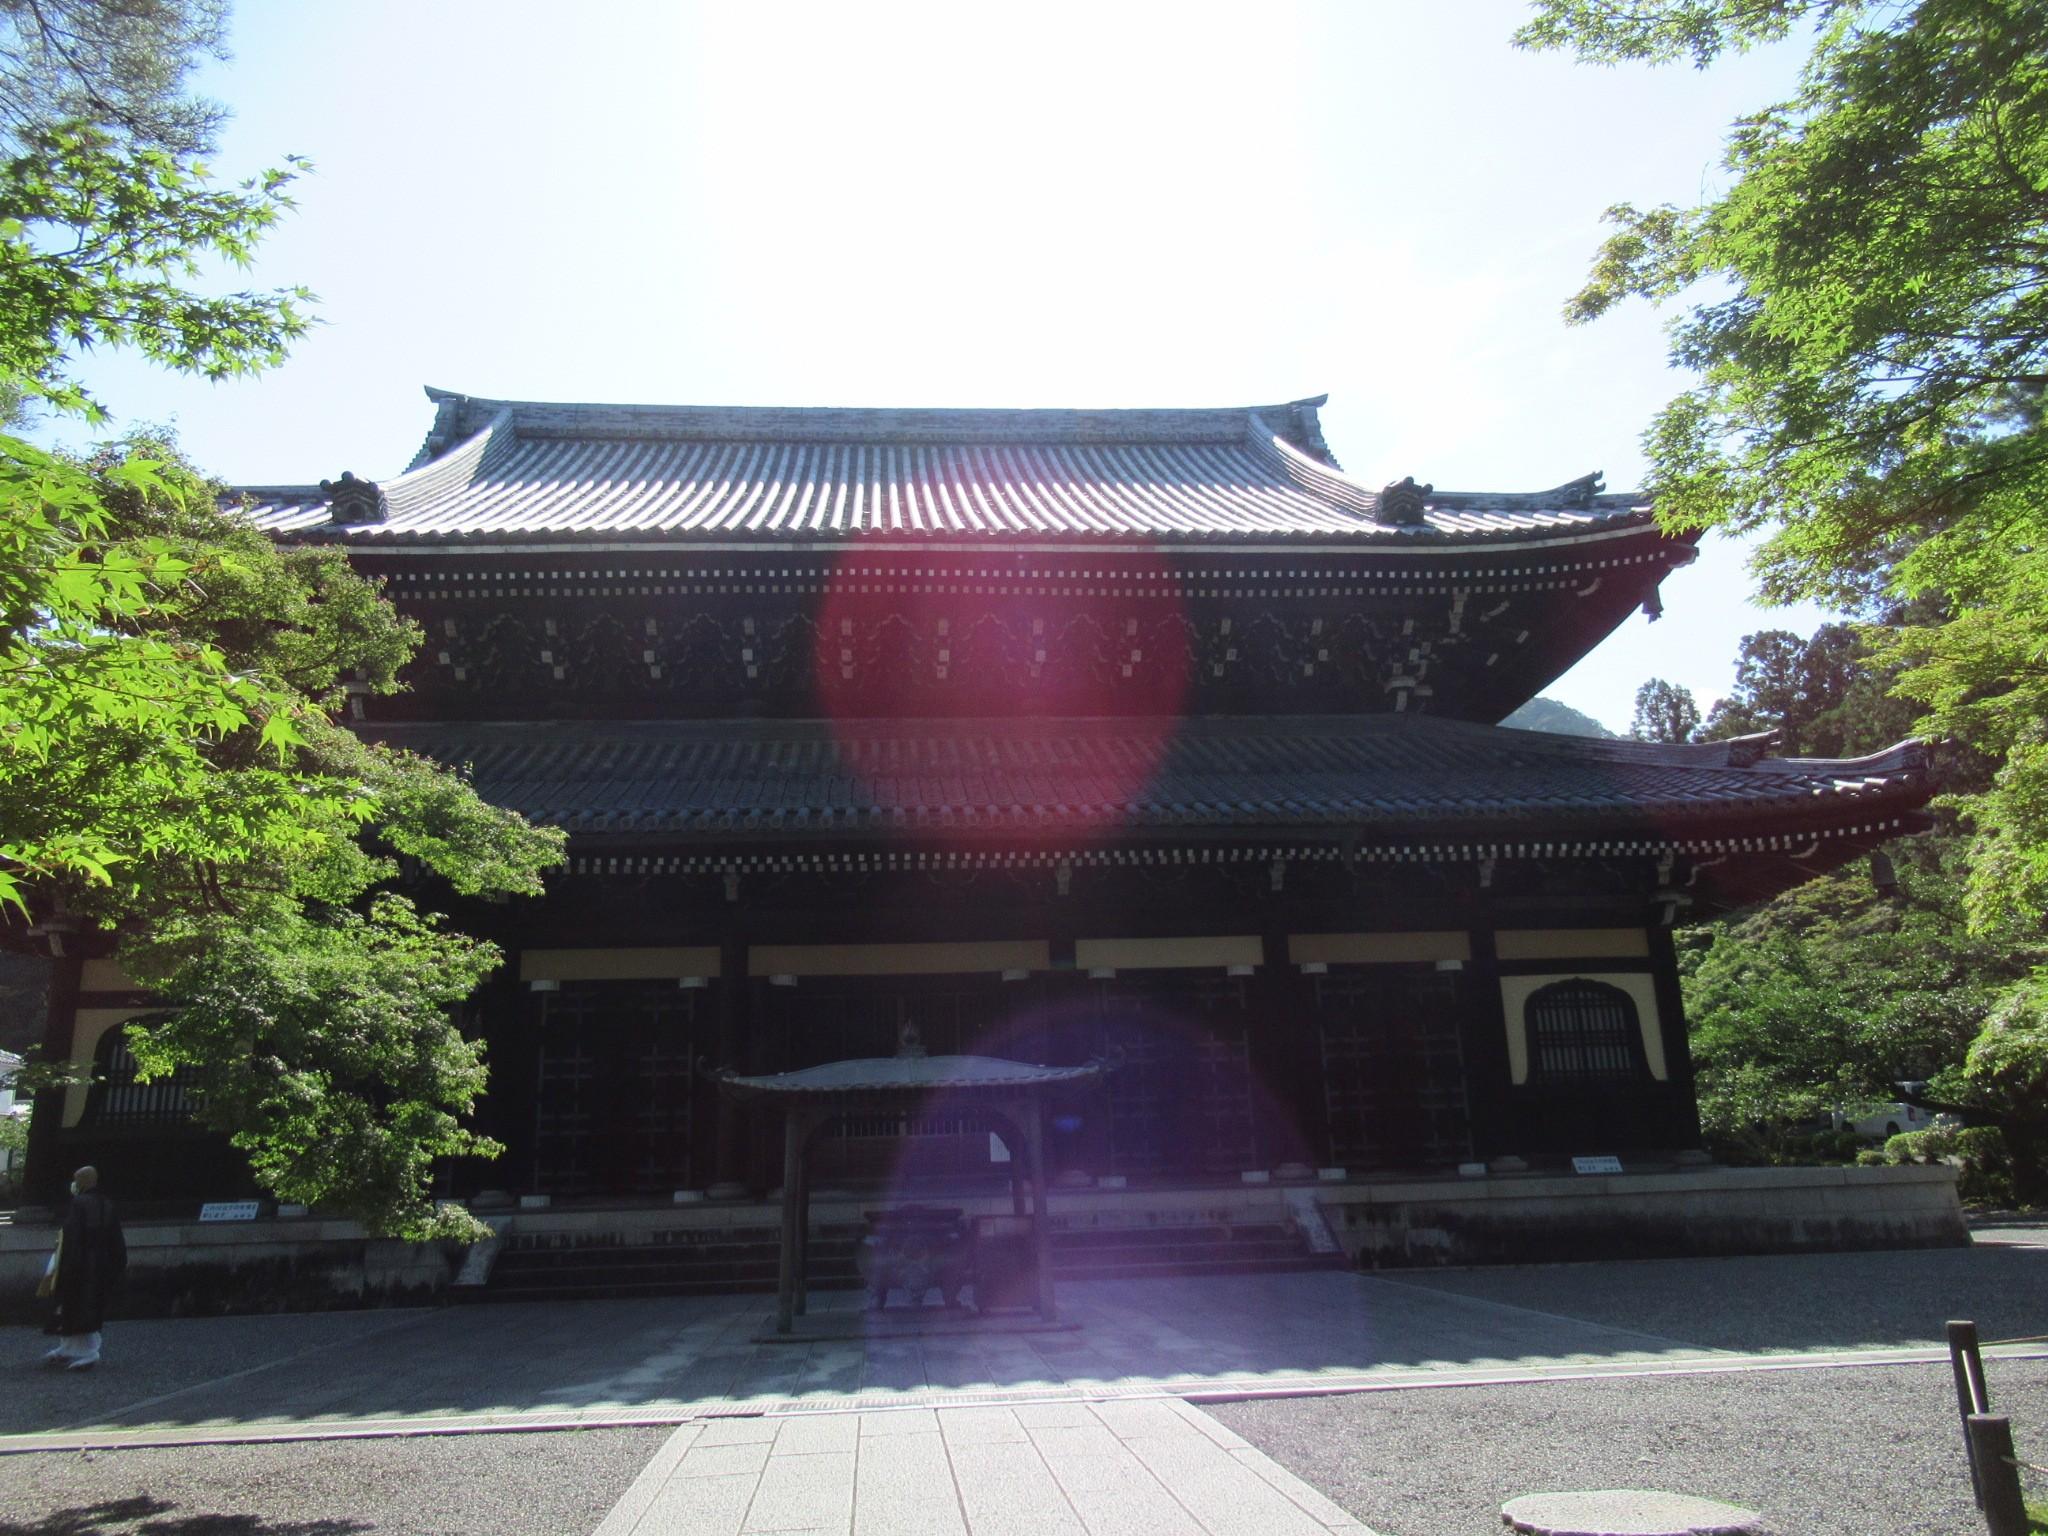 f:id:ichi-hama:20200802131140j:image